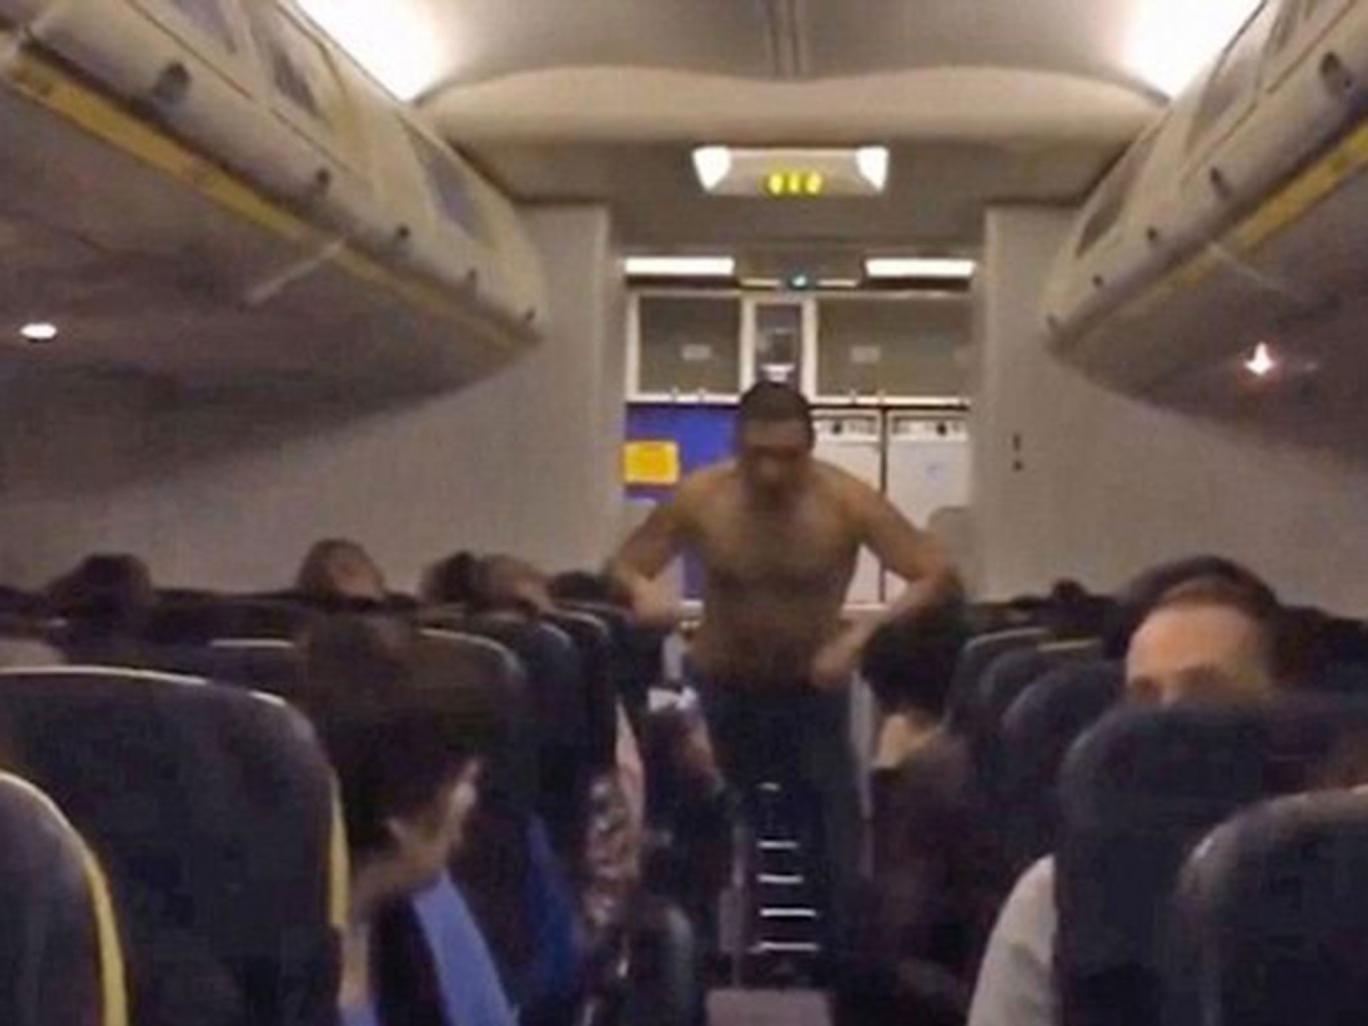 San Francisco-bound flight from Australia diverted over